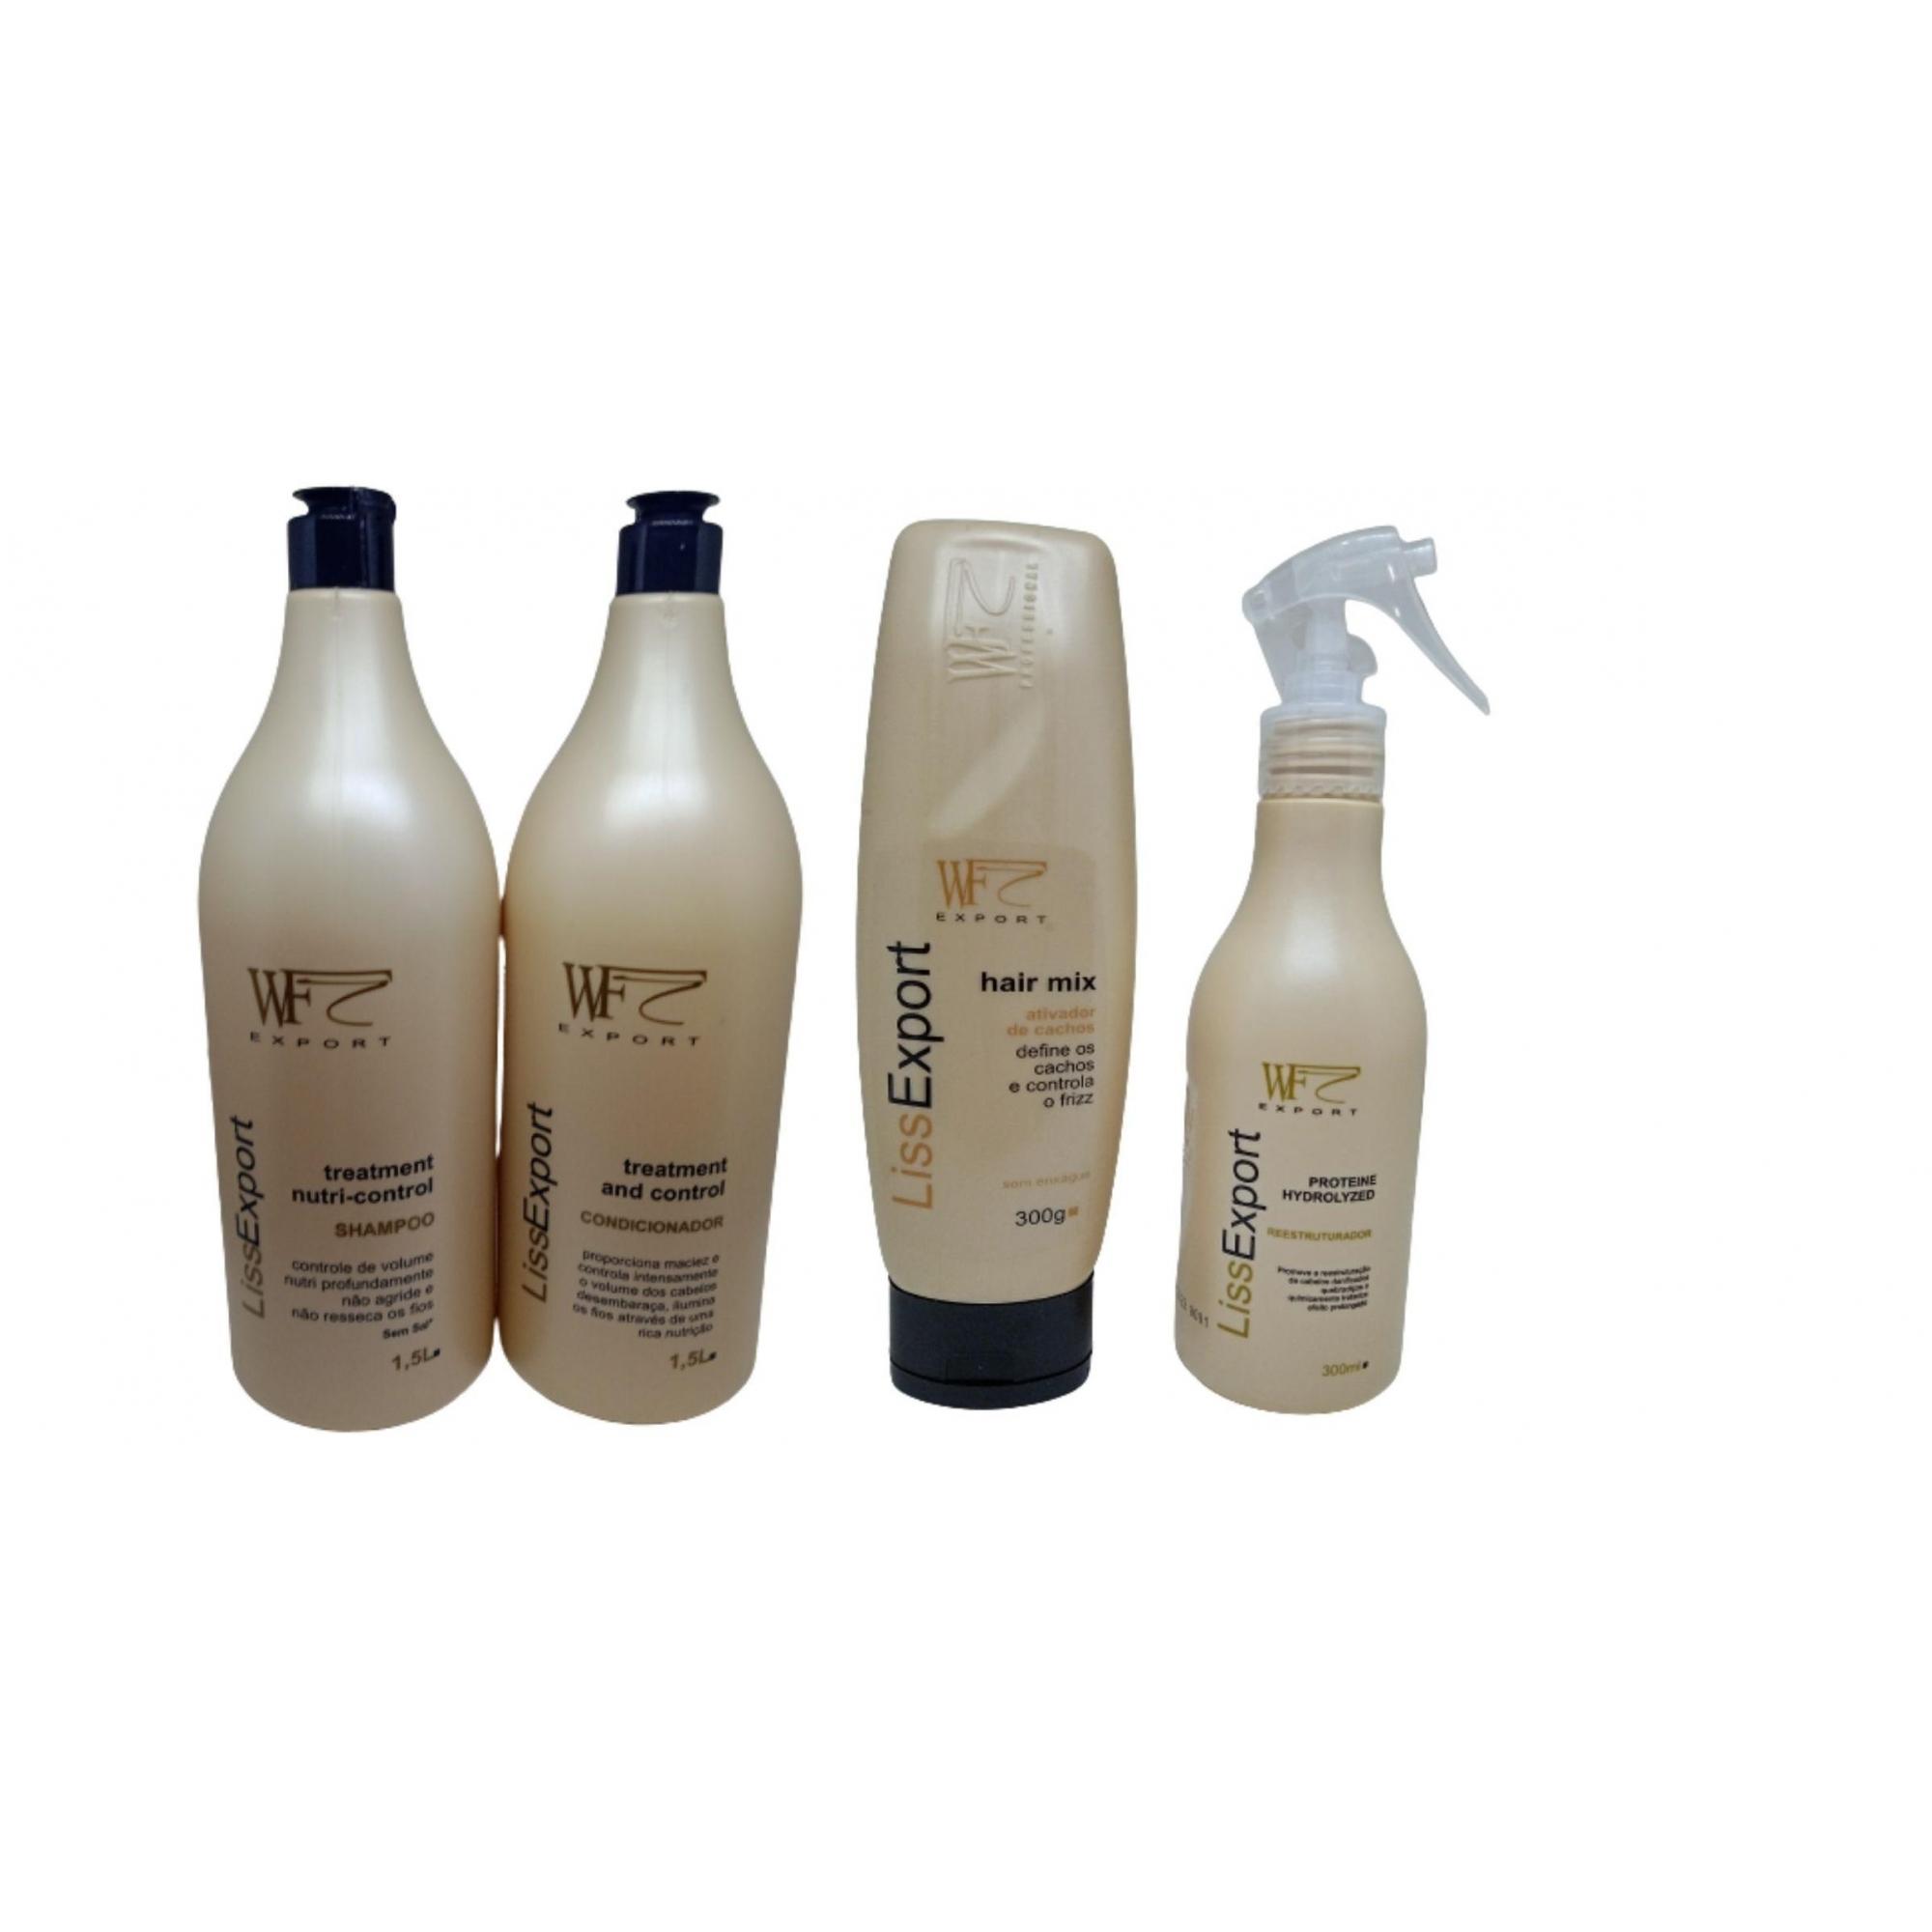 Kit Wf Cosméticos Liss Export Professional (4 Produtos)